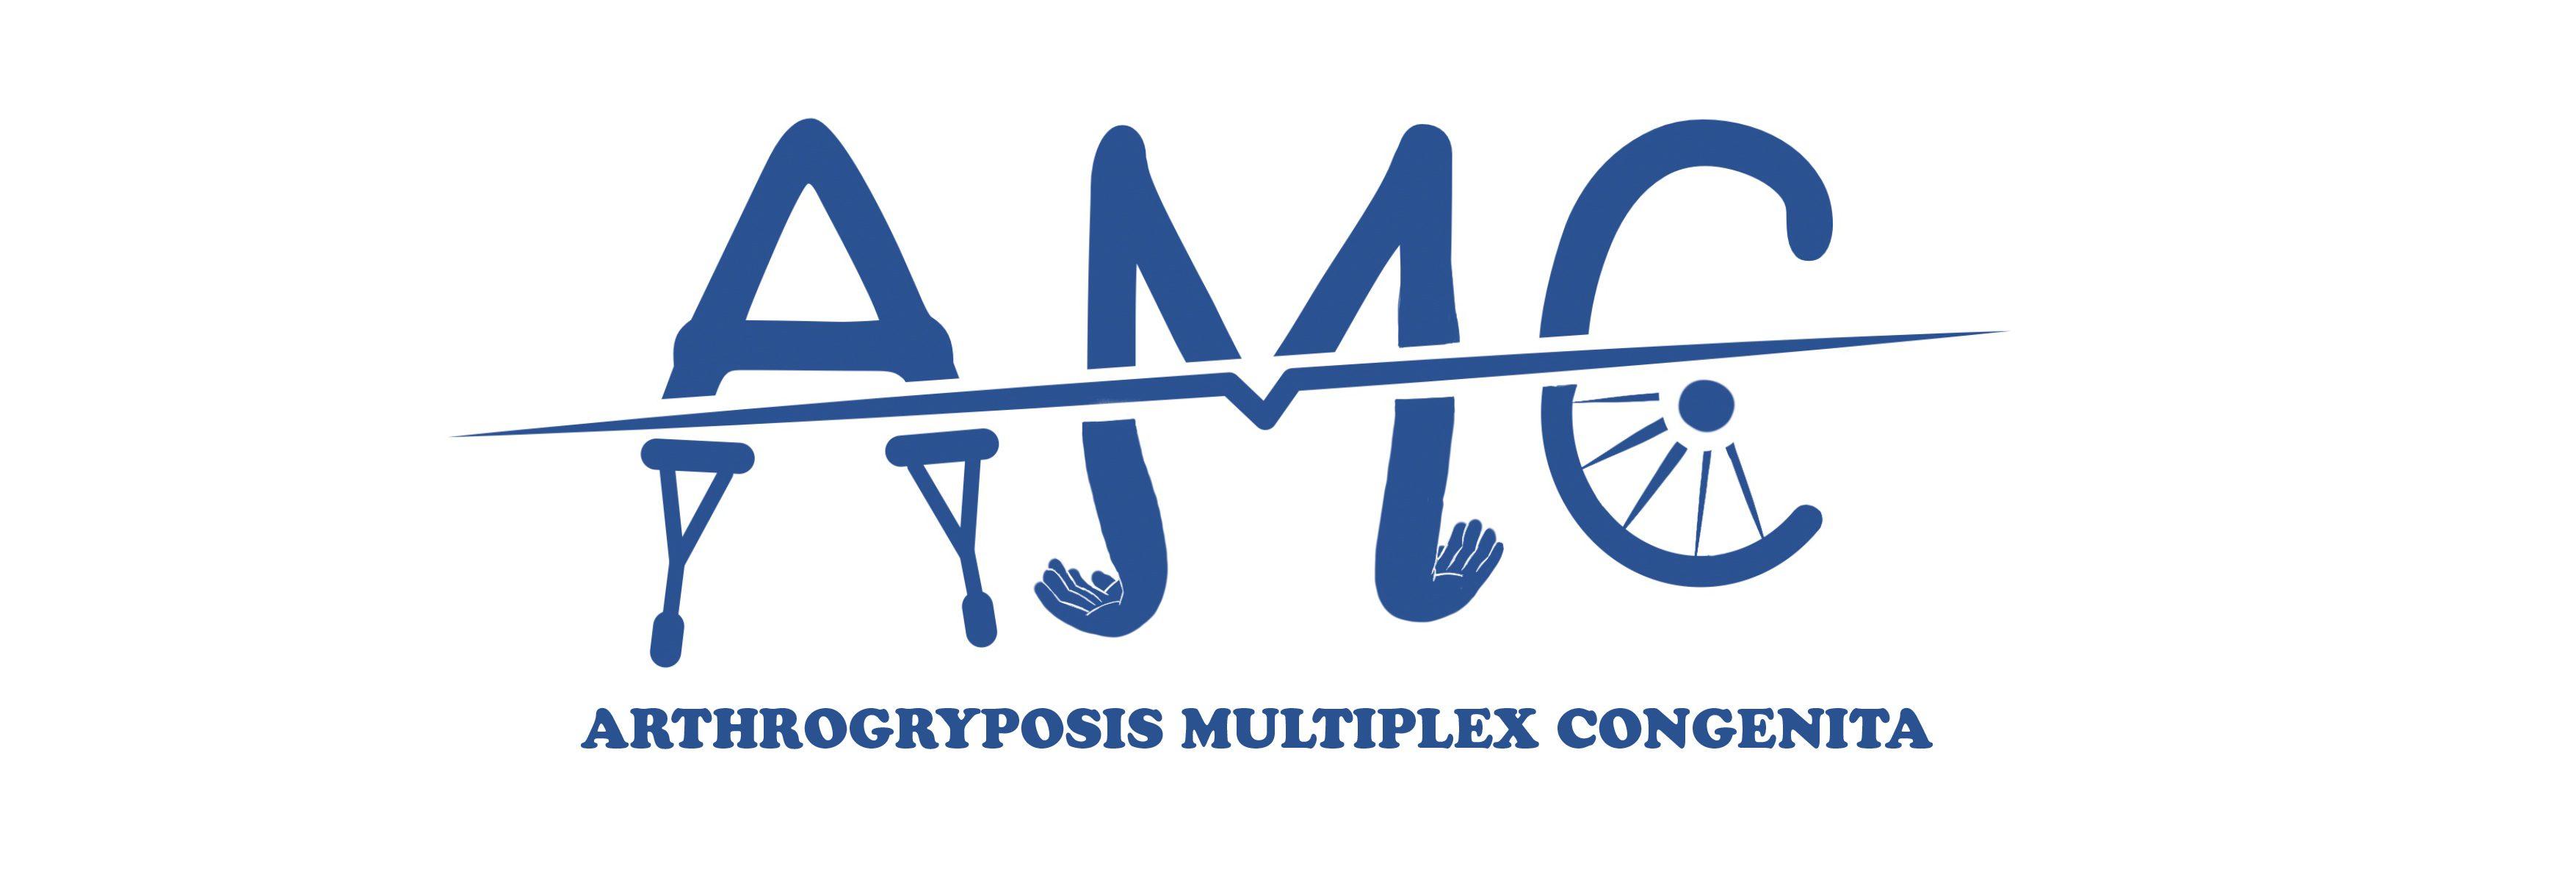 AMC Ry